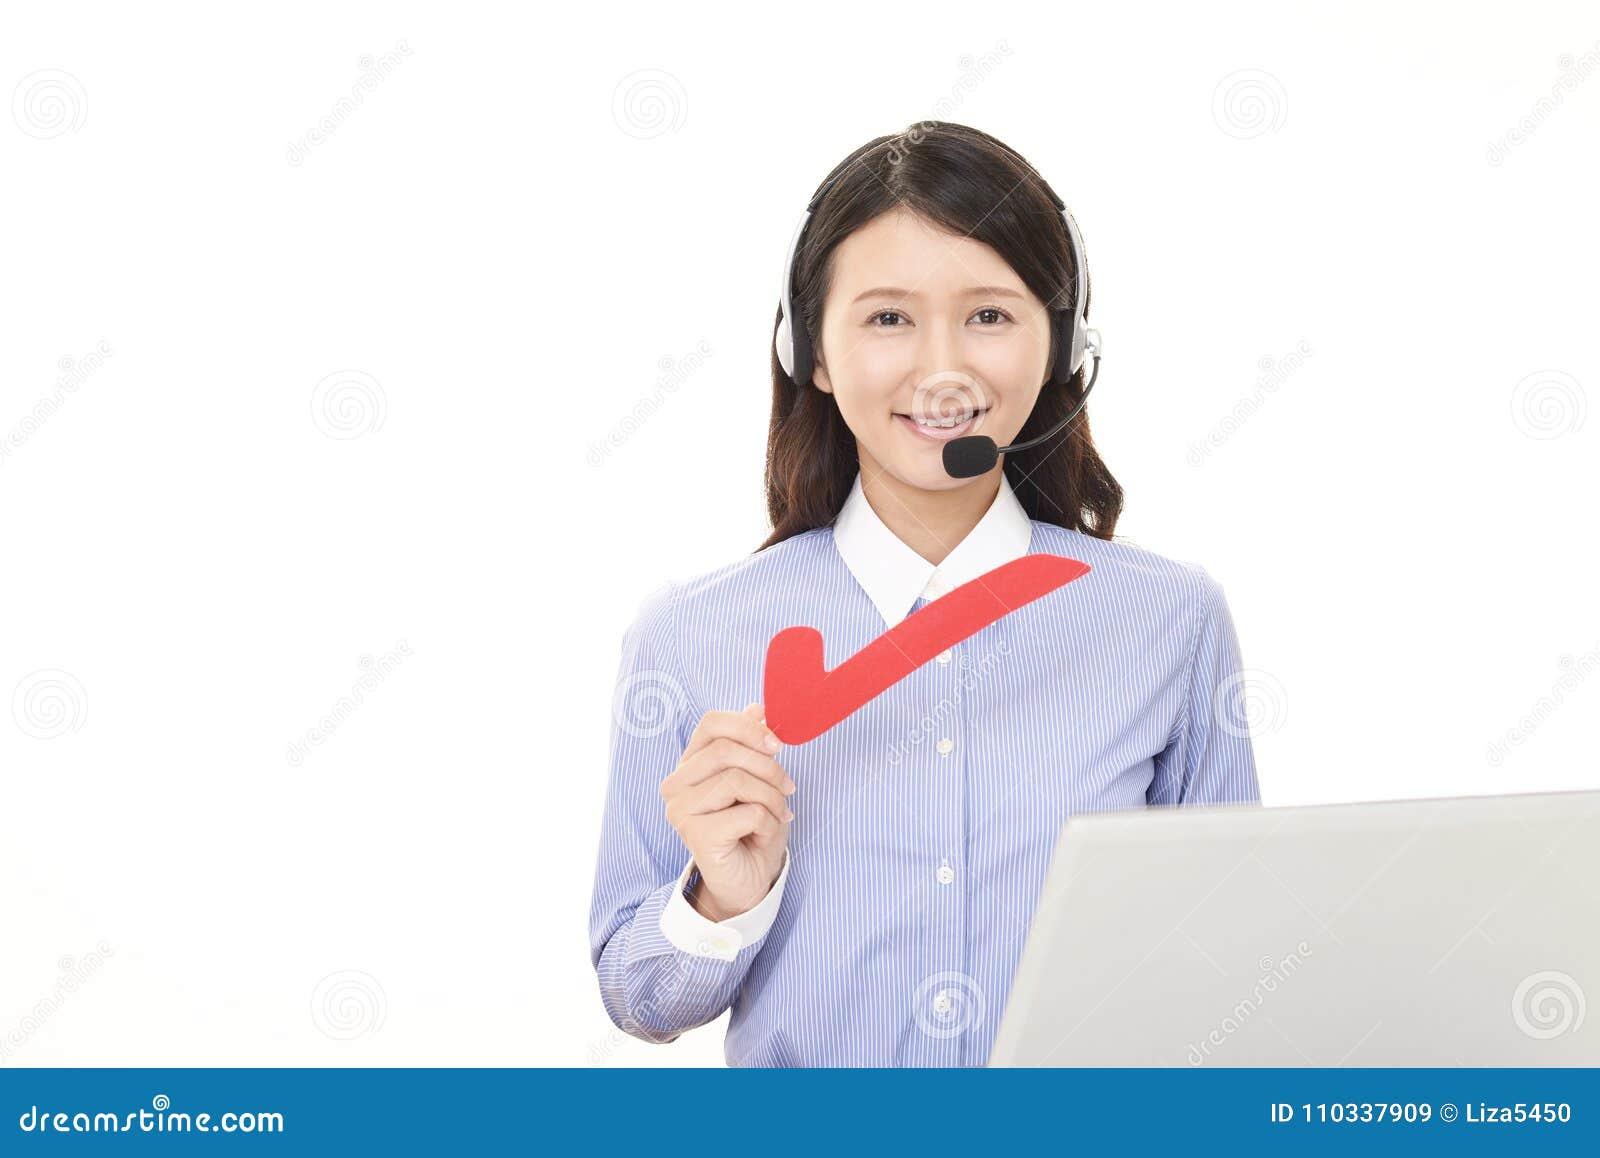 Call center operator with a check mark